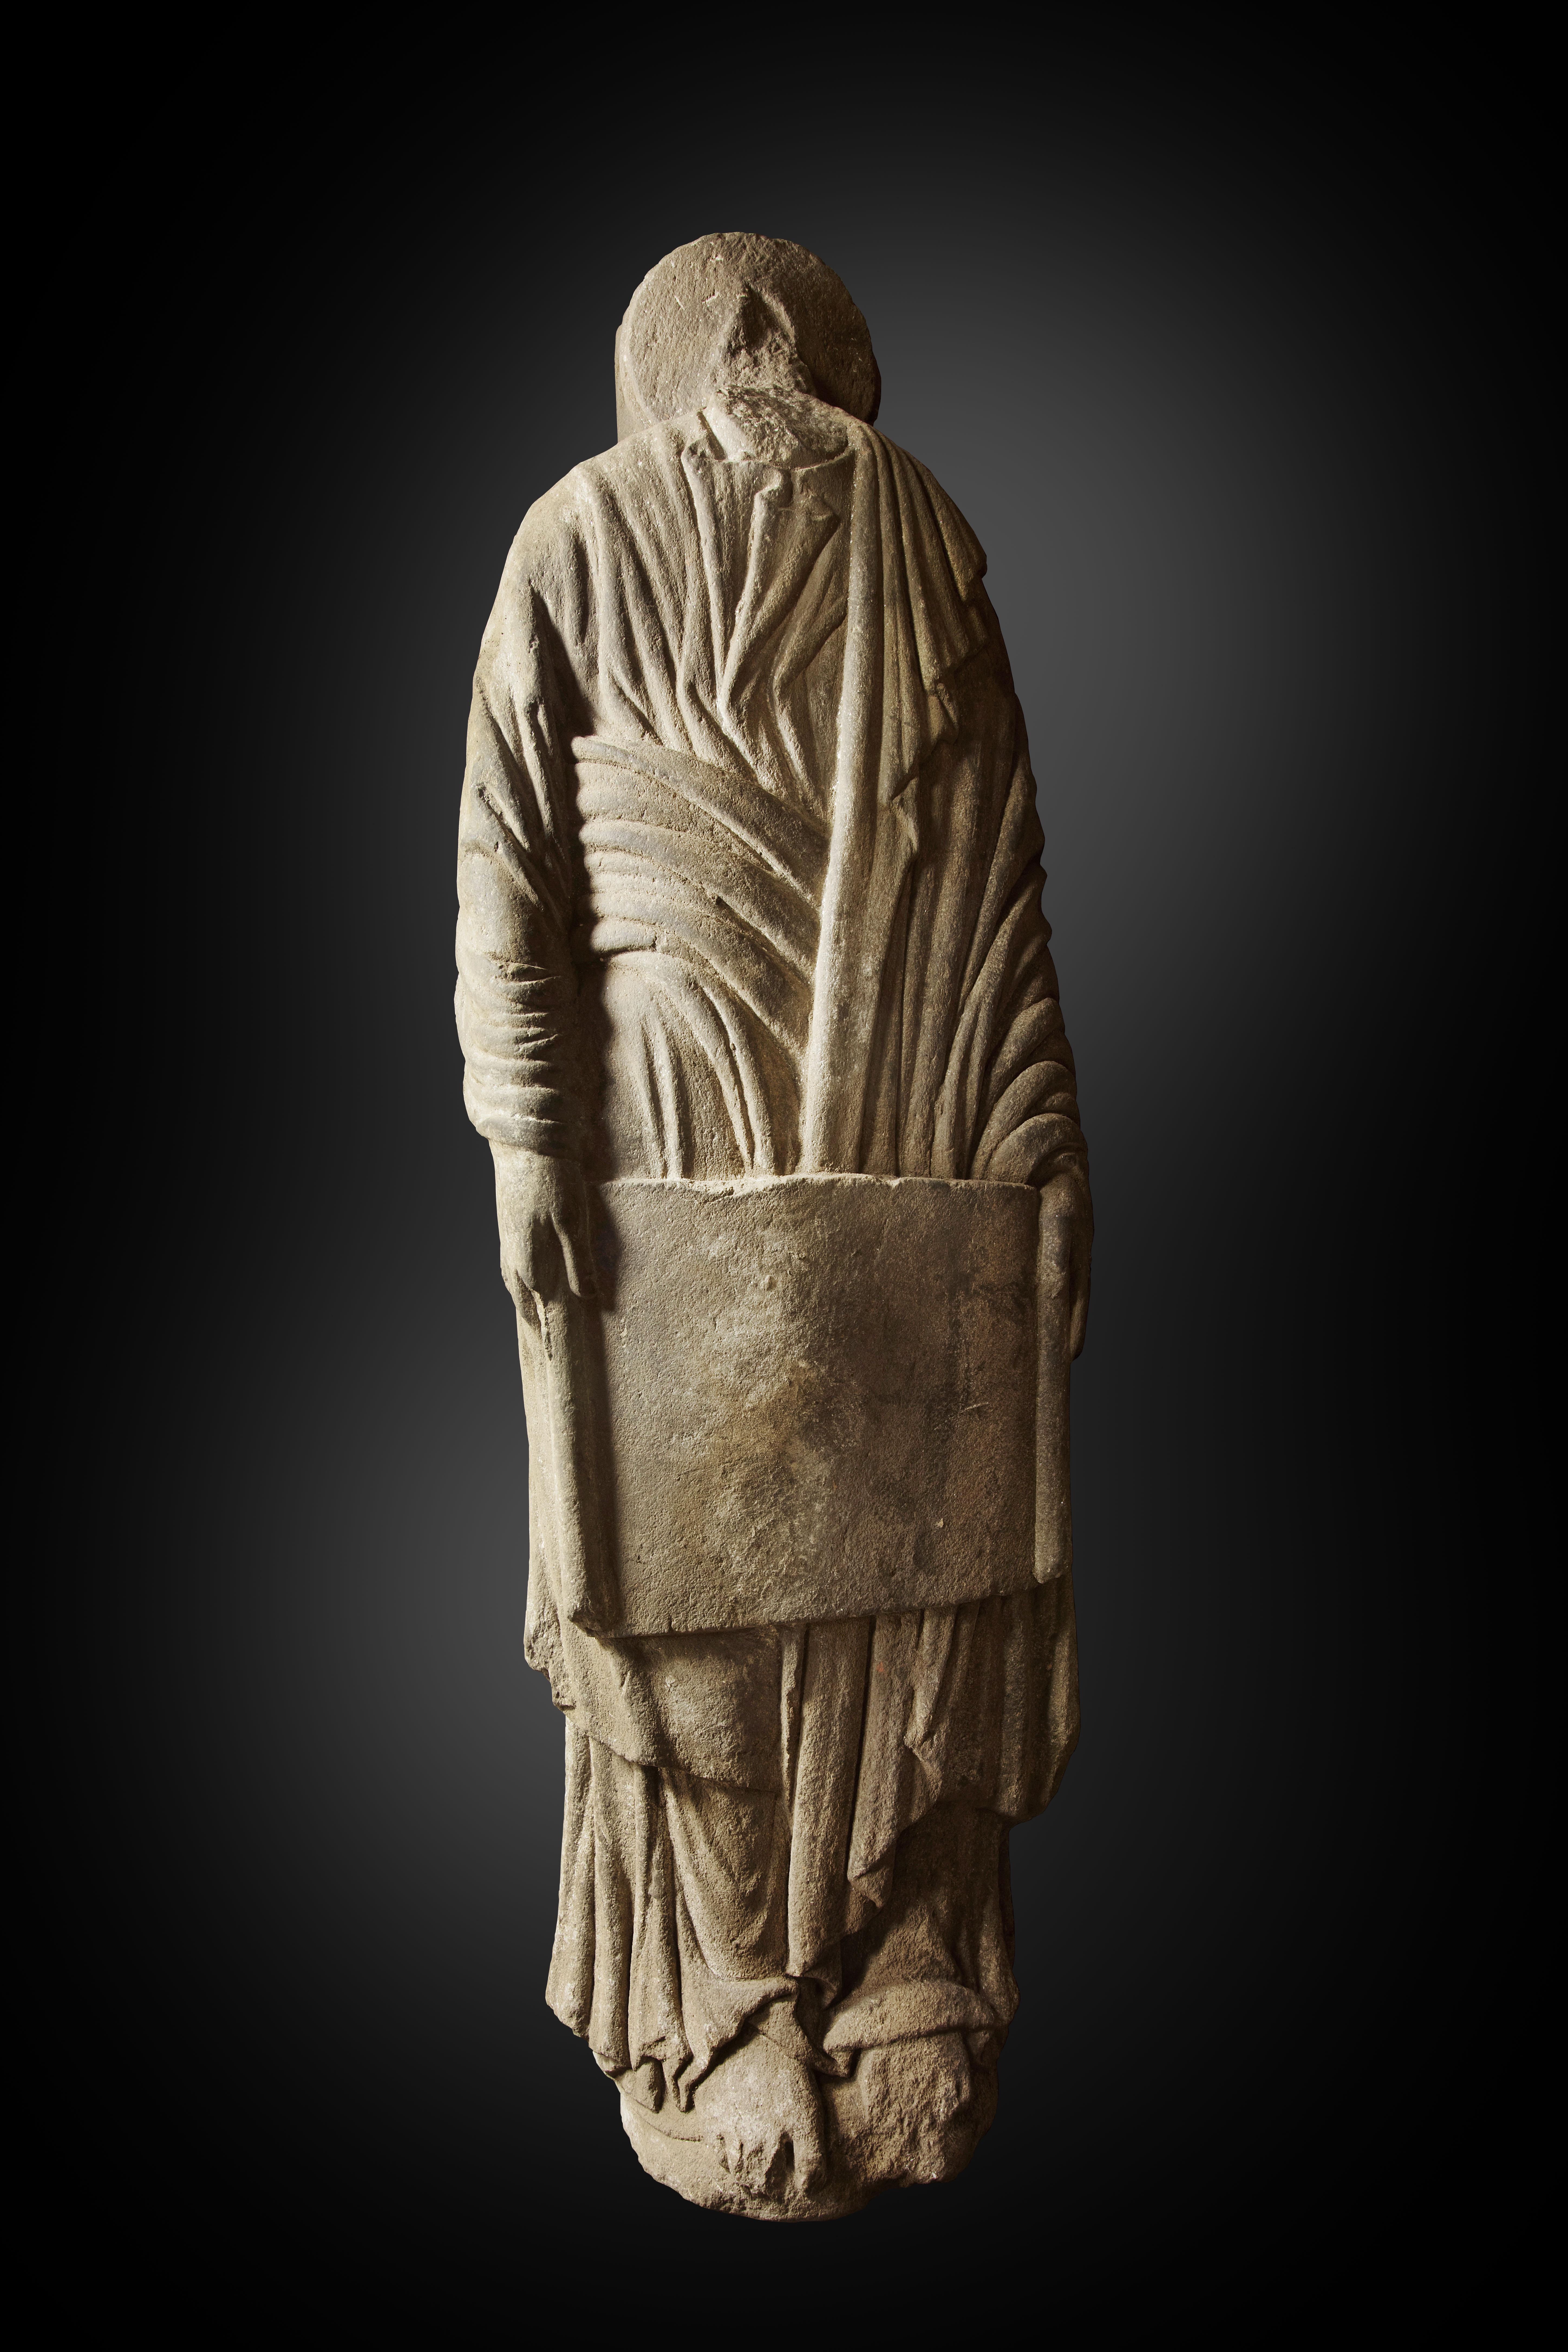 Estatua-Columna-masculina-con-cartela